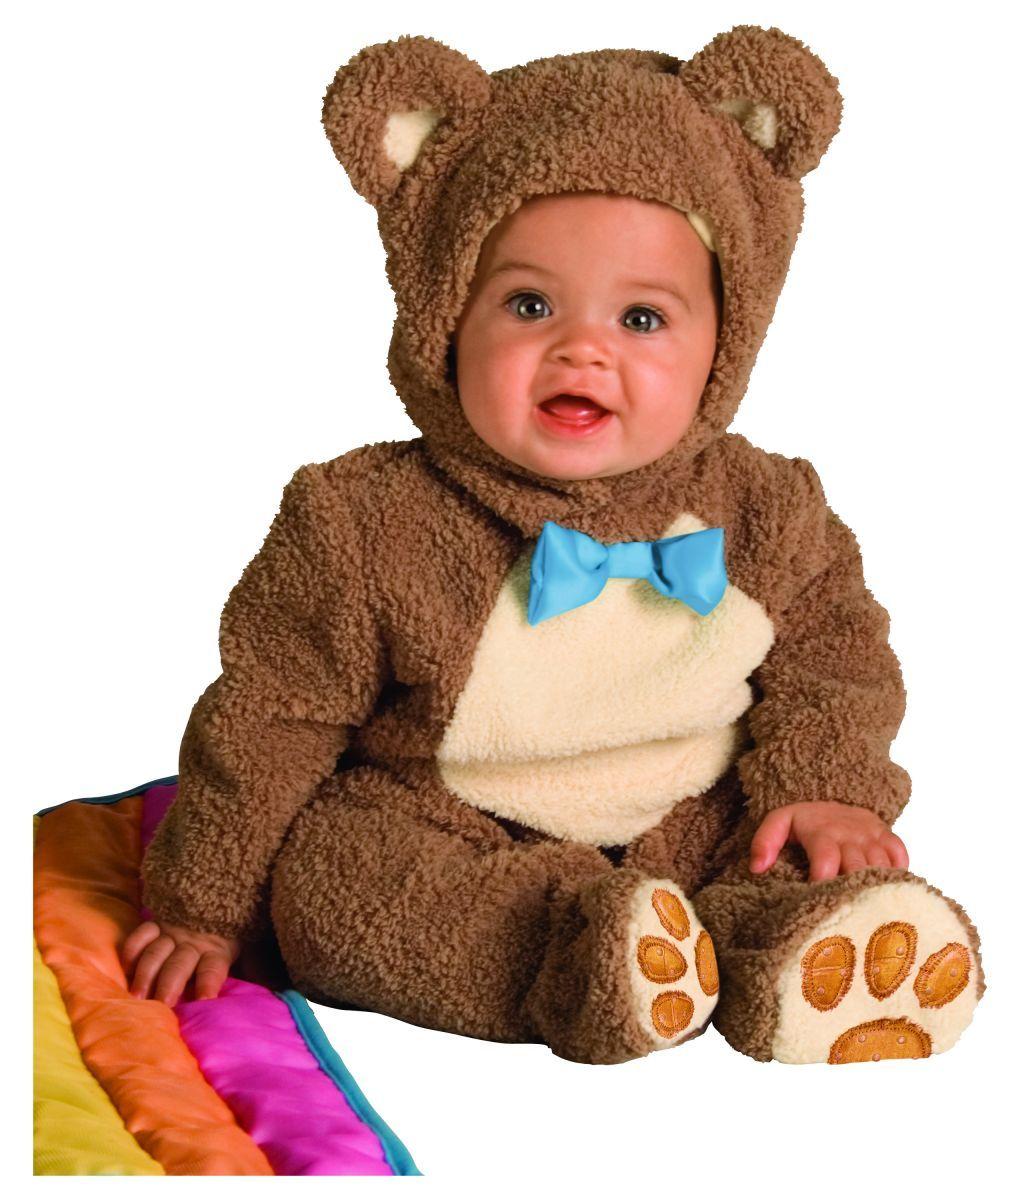 Little Brown Bear Baby Halloween Costume Size 18 24 Months